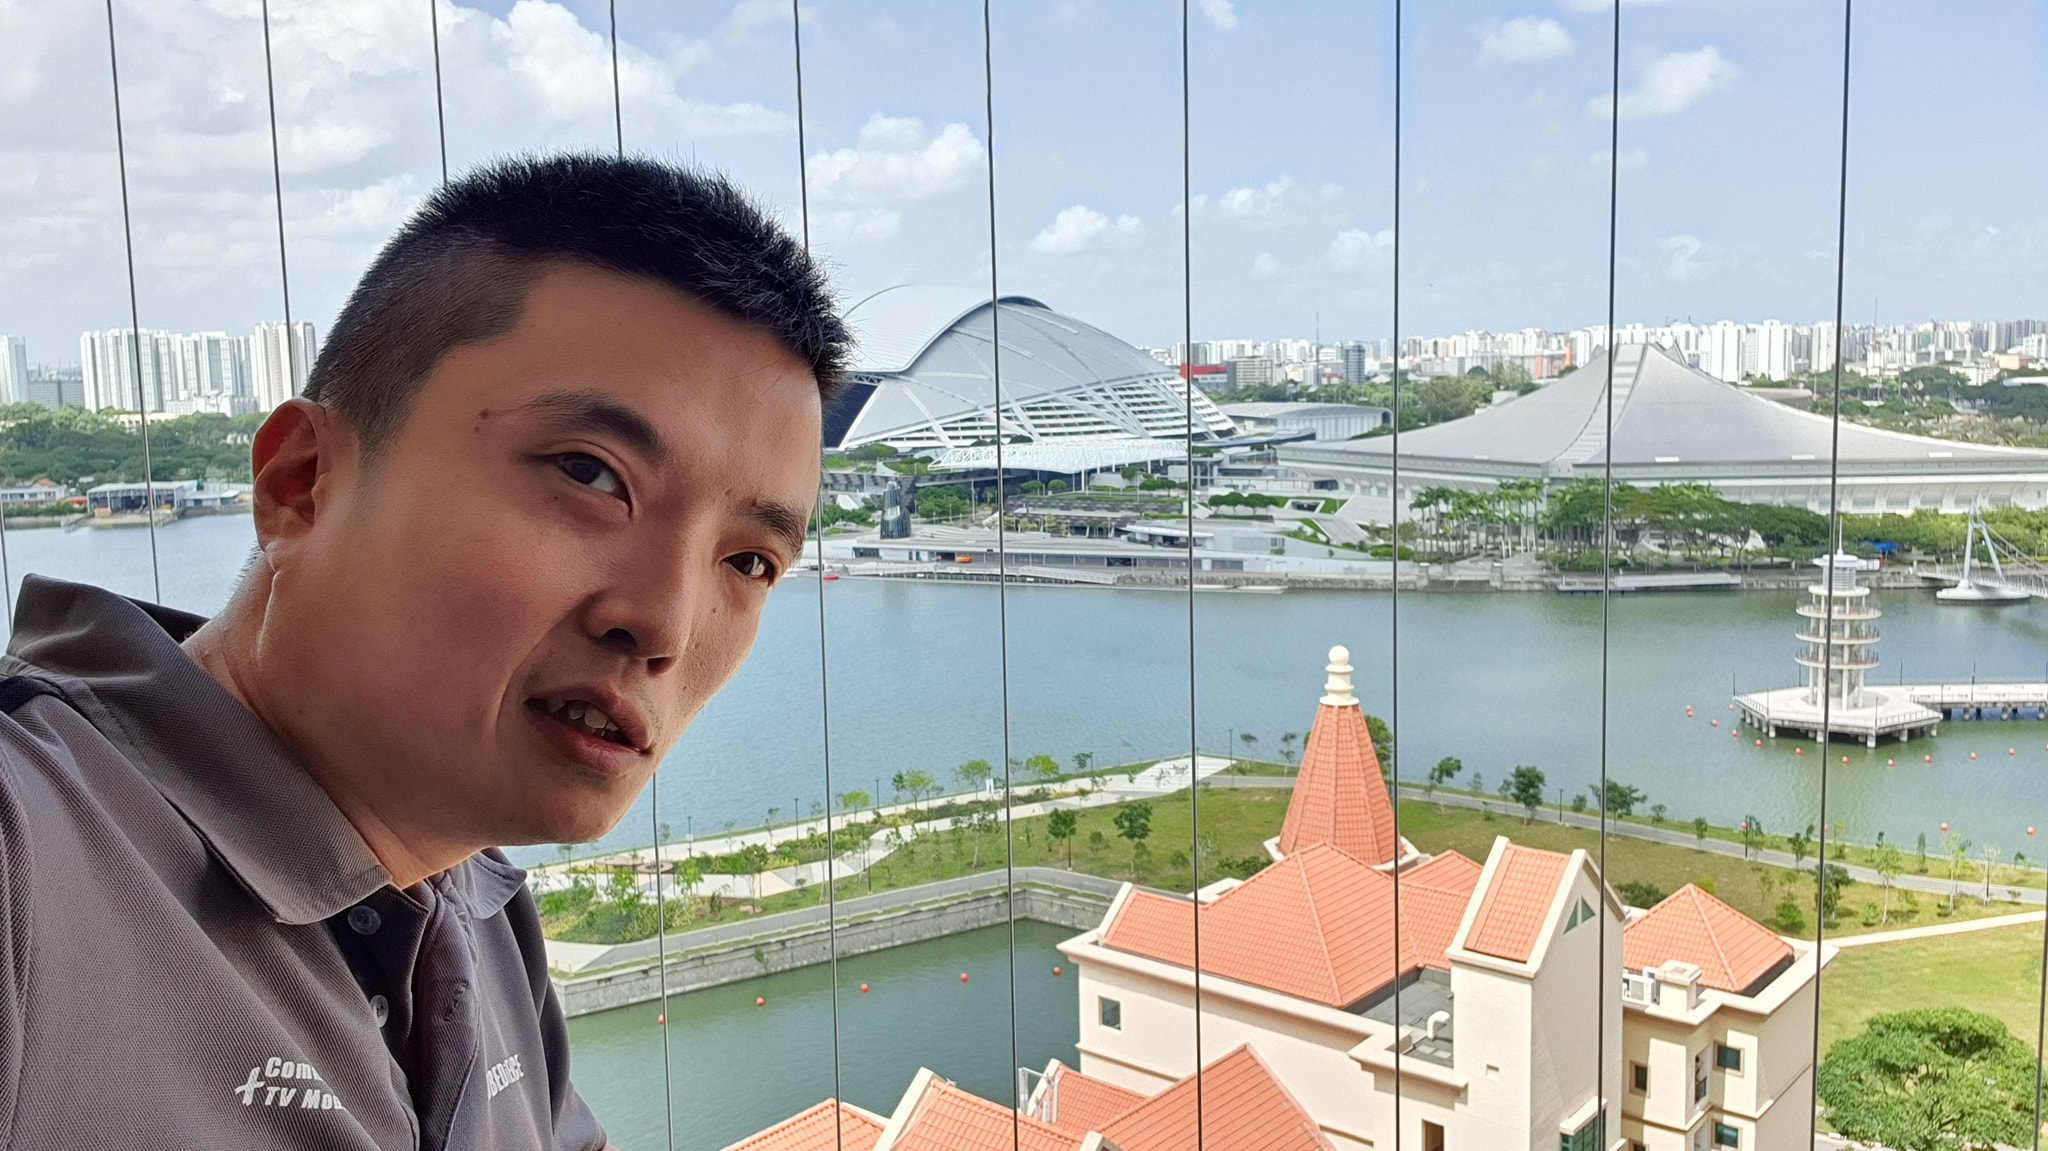 Glenn Zhang photo - Review us